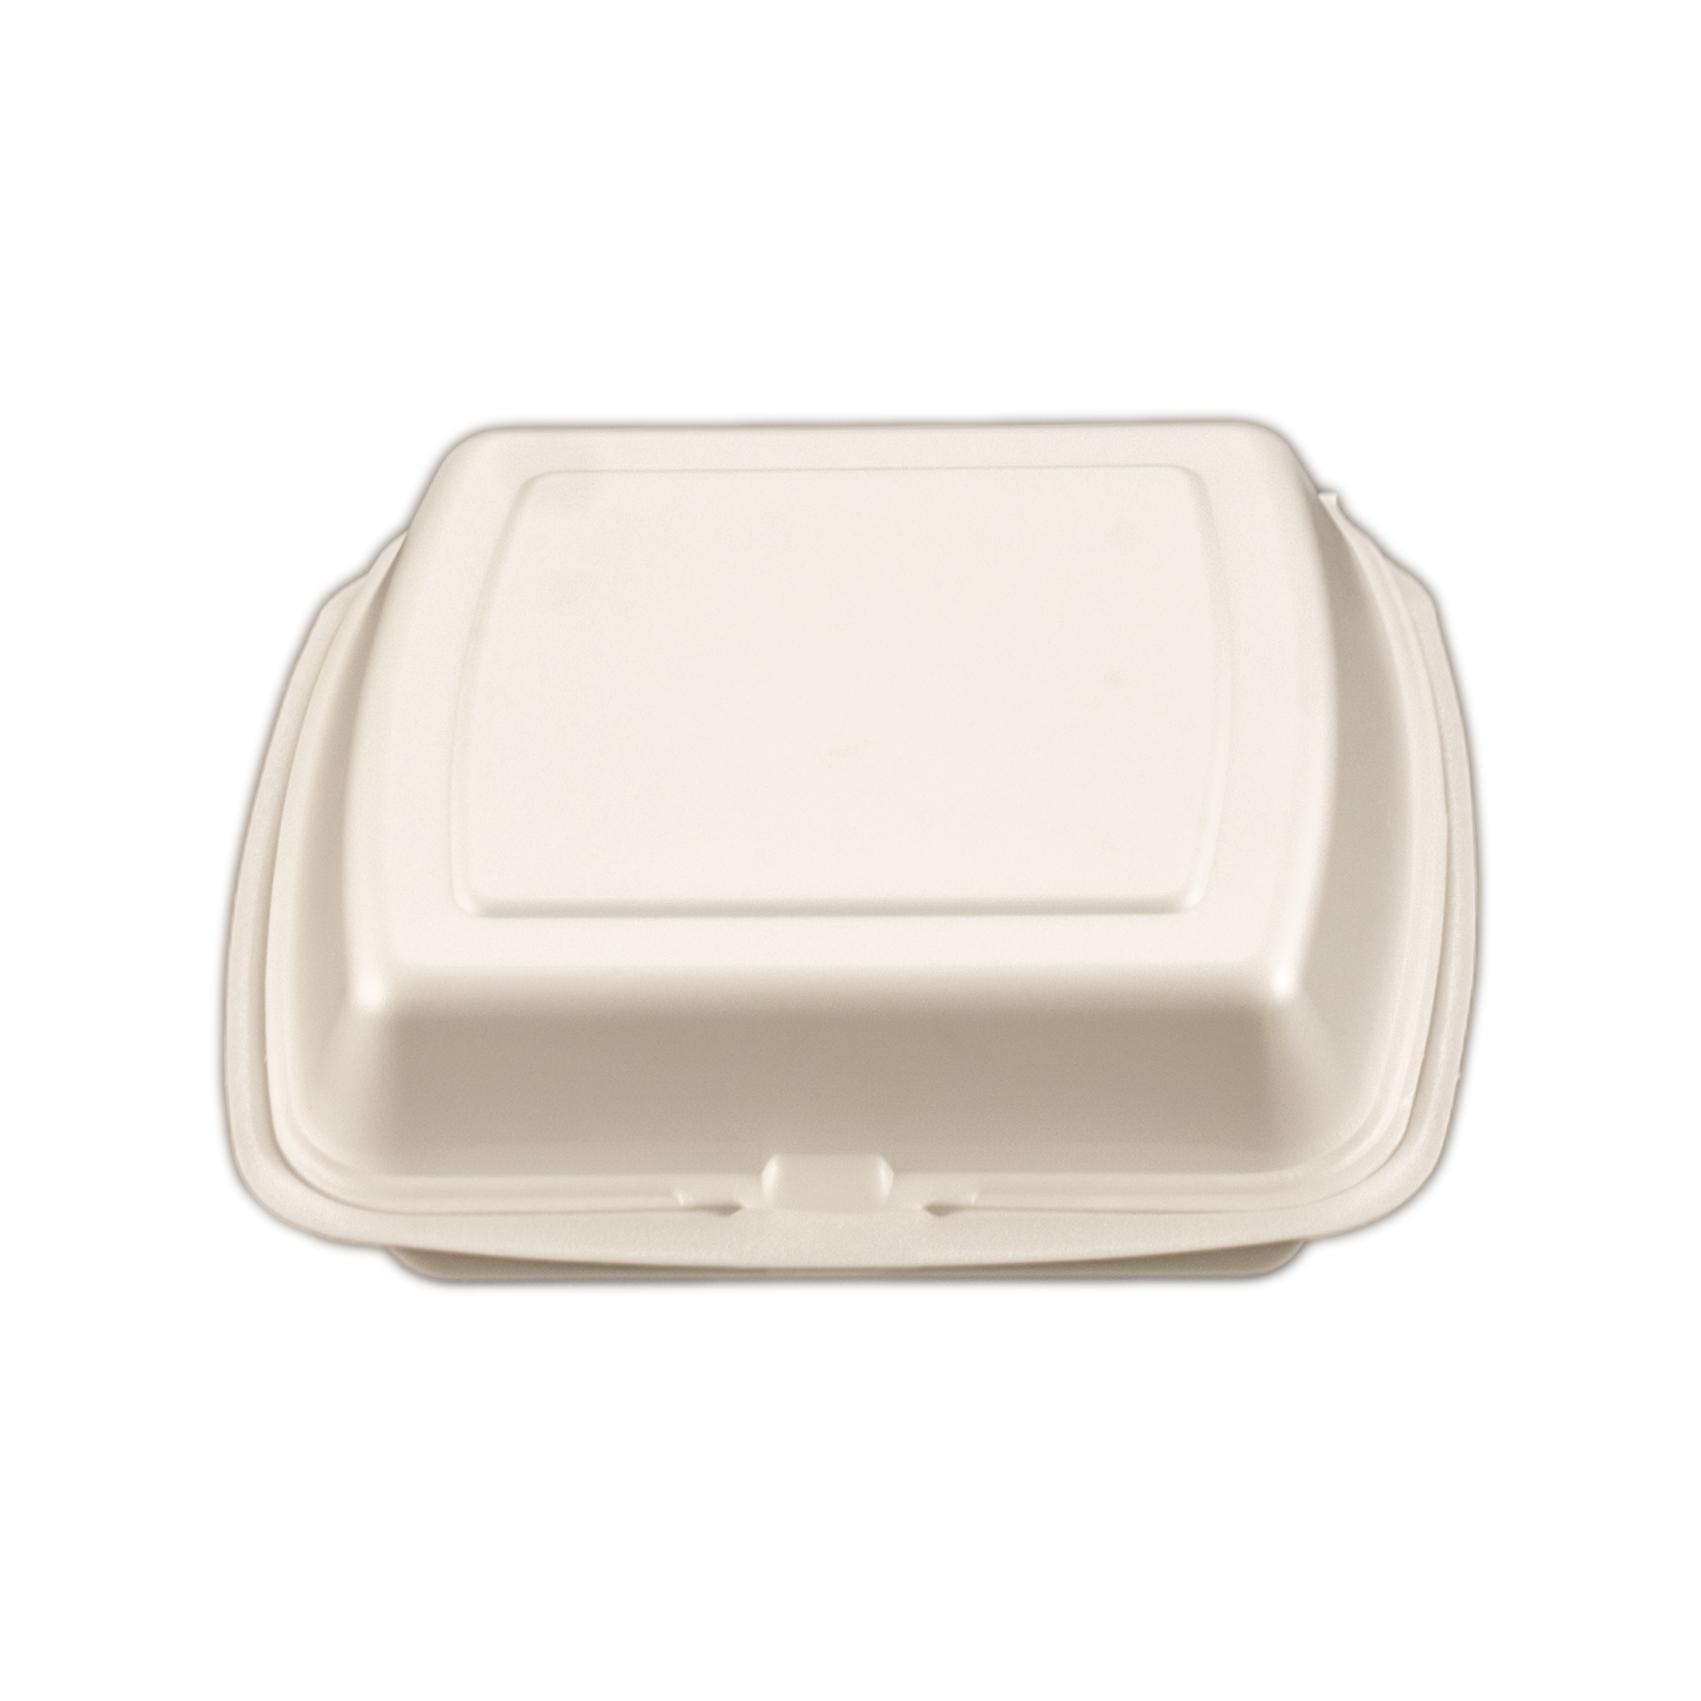 iK-FC17      Foam Clam Dinner Pack    231 x 301 x 42mm 100 per slv 200 per carton